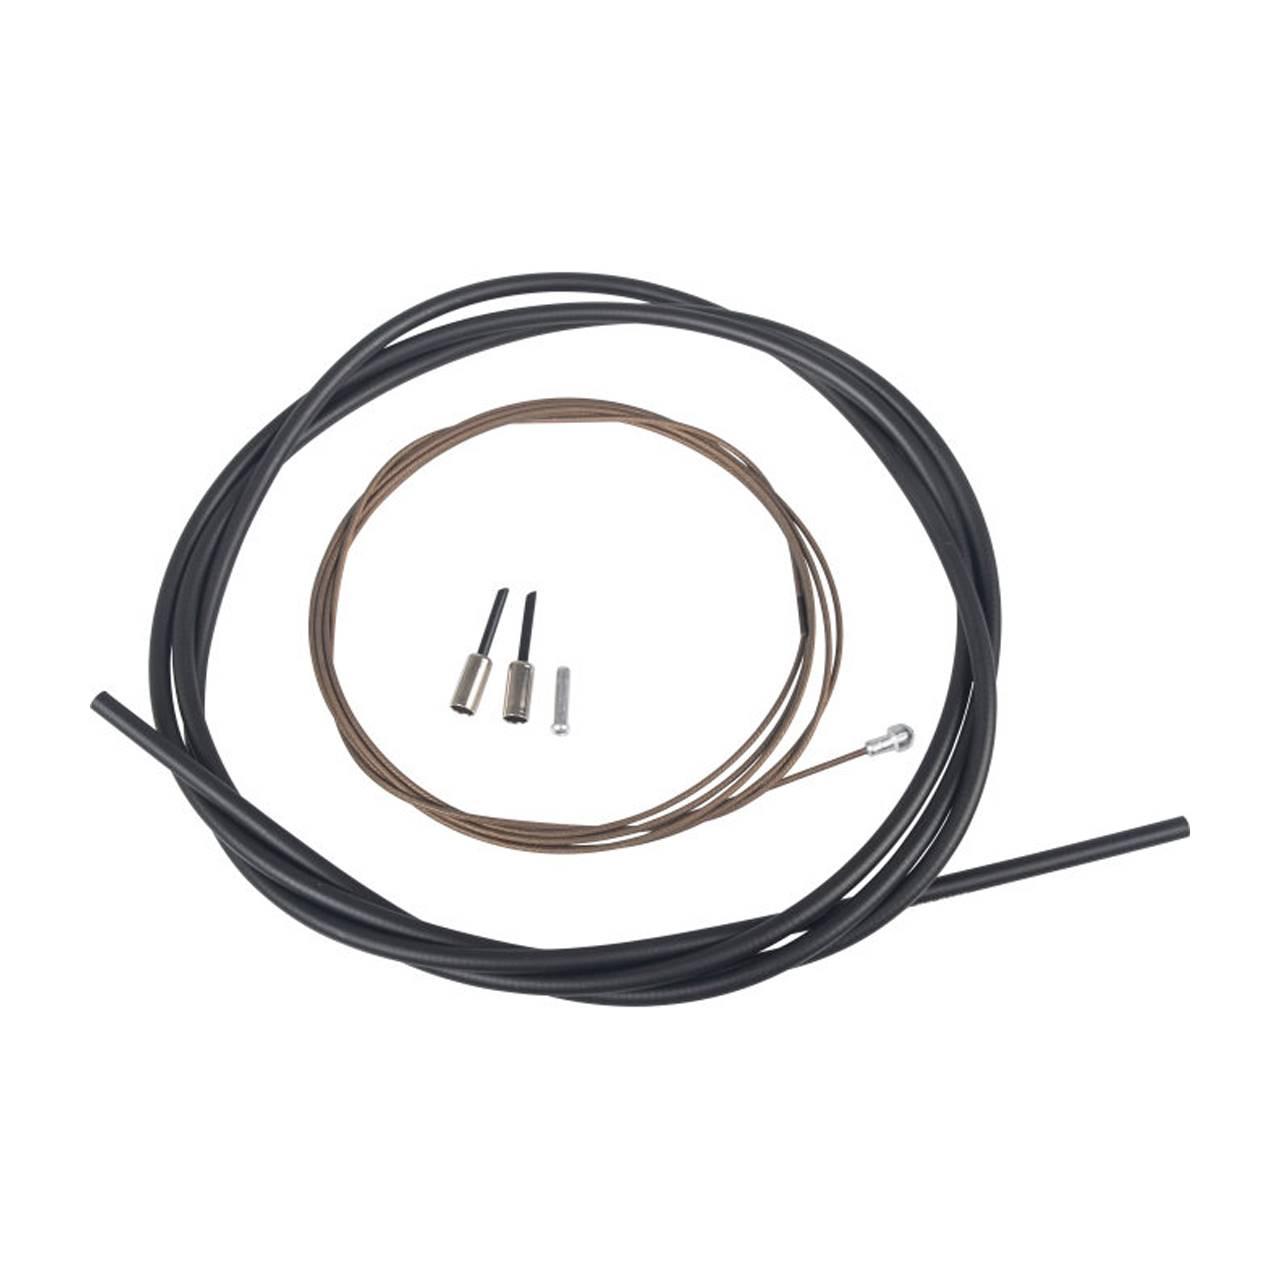 Shimano Bremskabel HR BC-R680 schwarz 1800 X 2000 mm